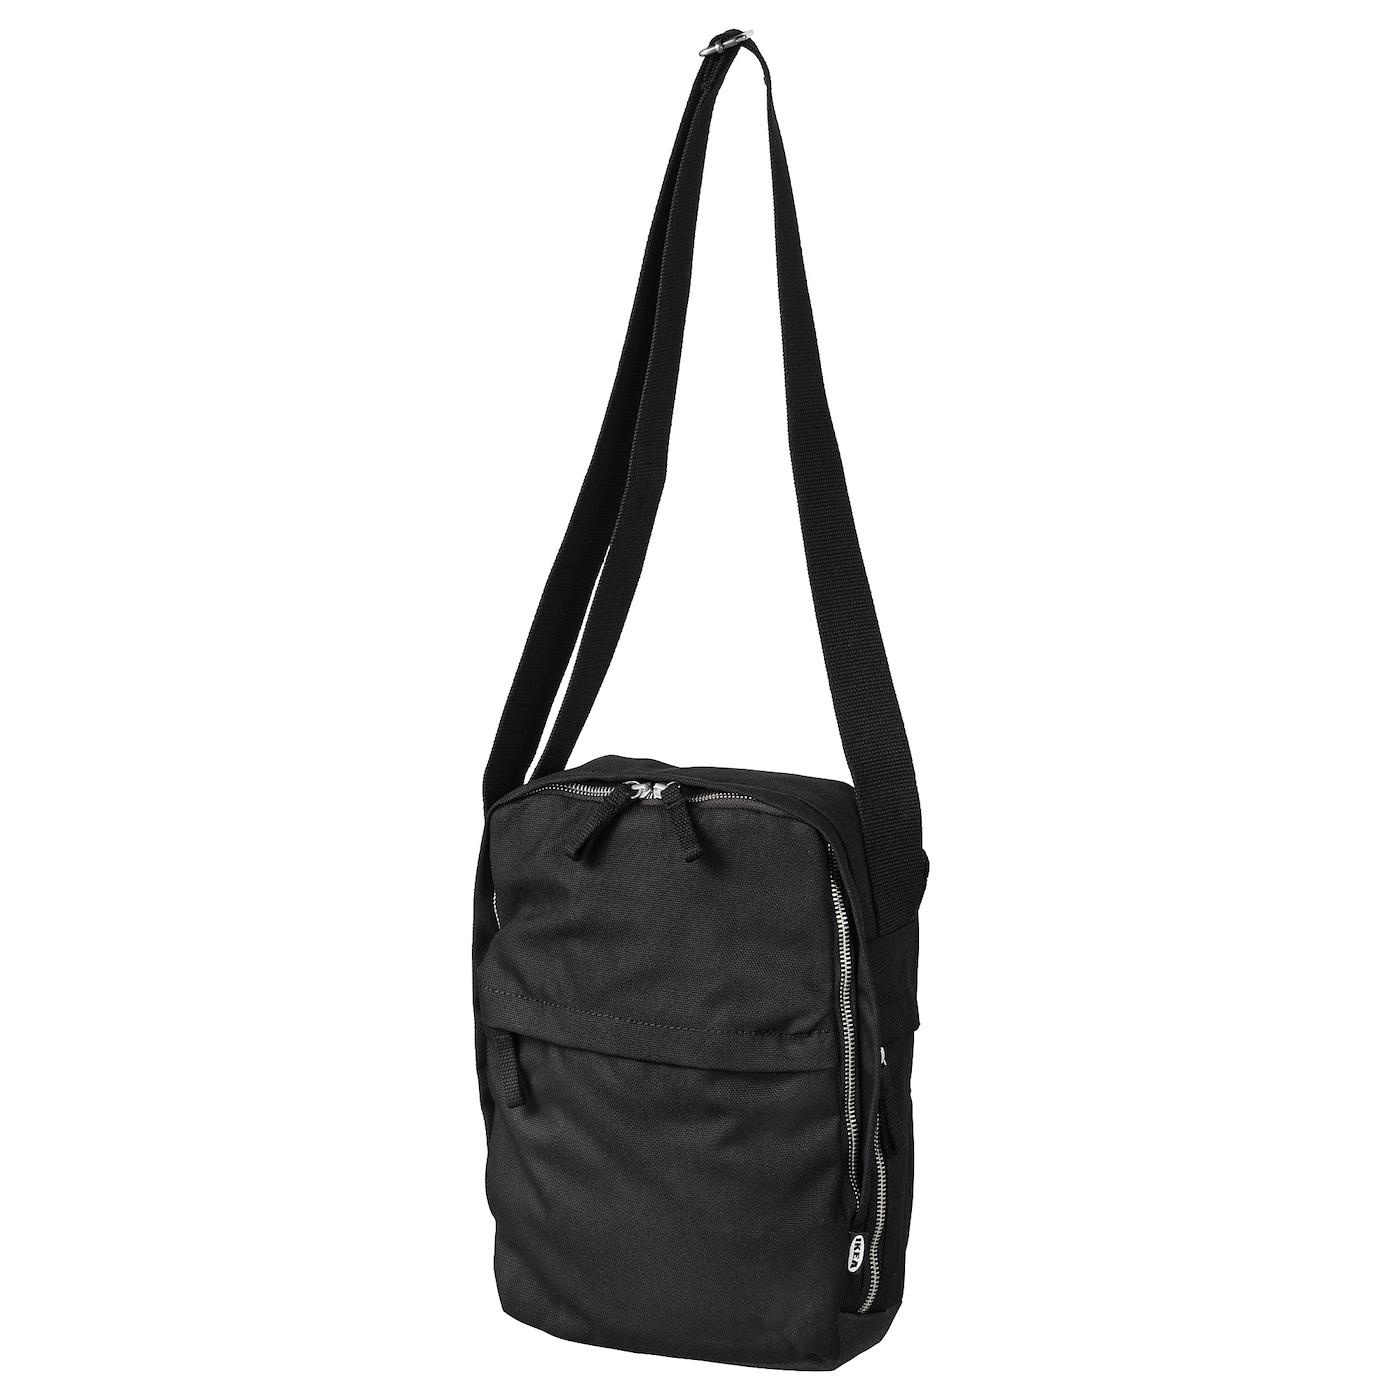 01863018982 Travel Luggage - Ponchos, Padlocks & Toiletry Bags - IKEA